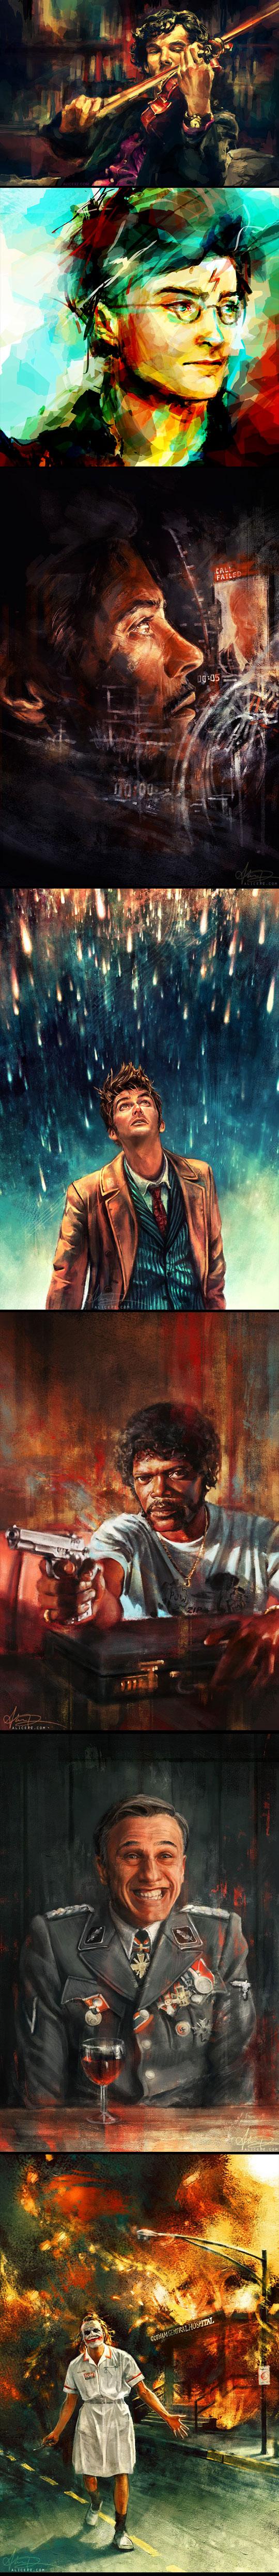 cool-art-Sherlock-Harry-Potter-digital-colors